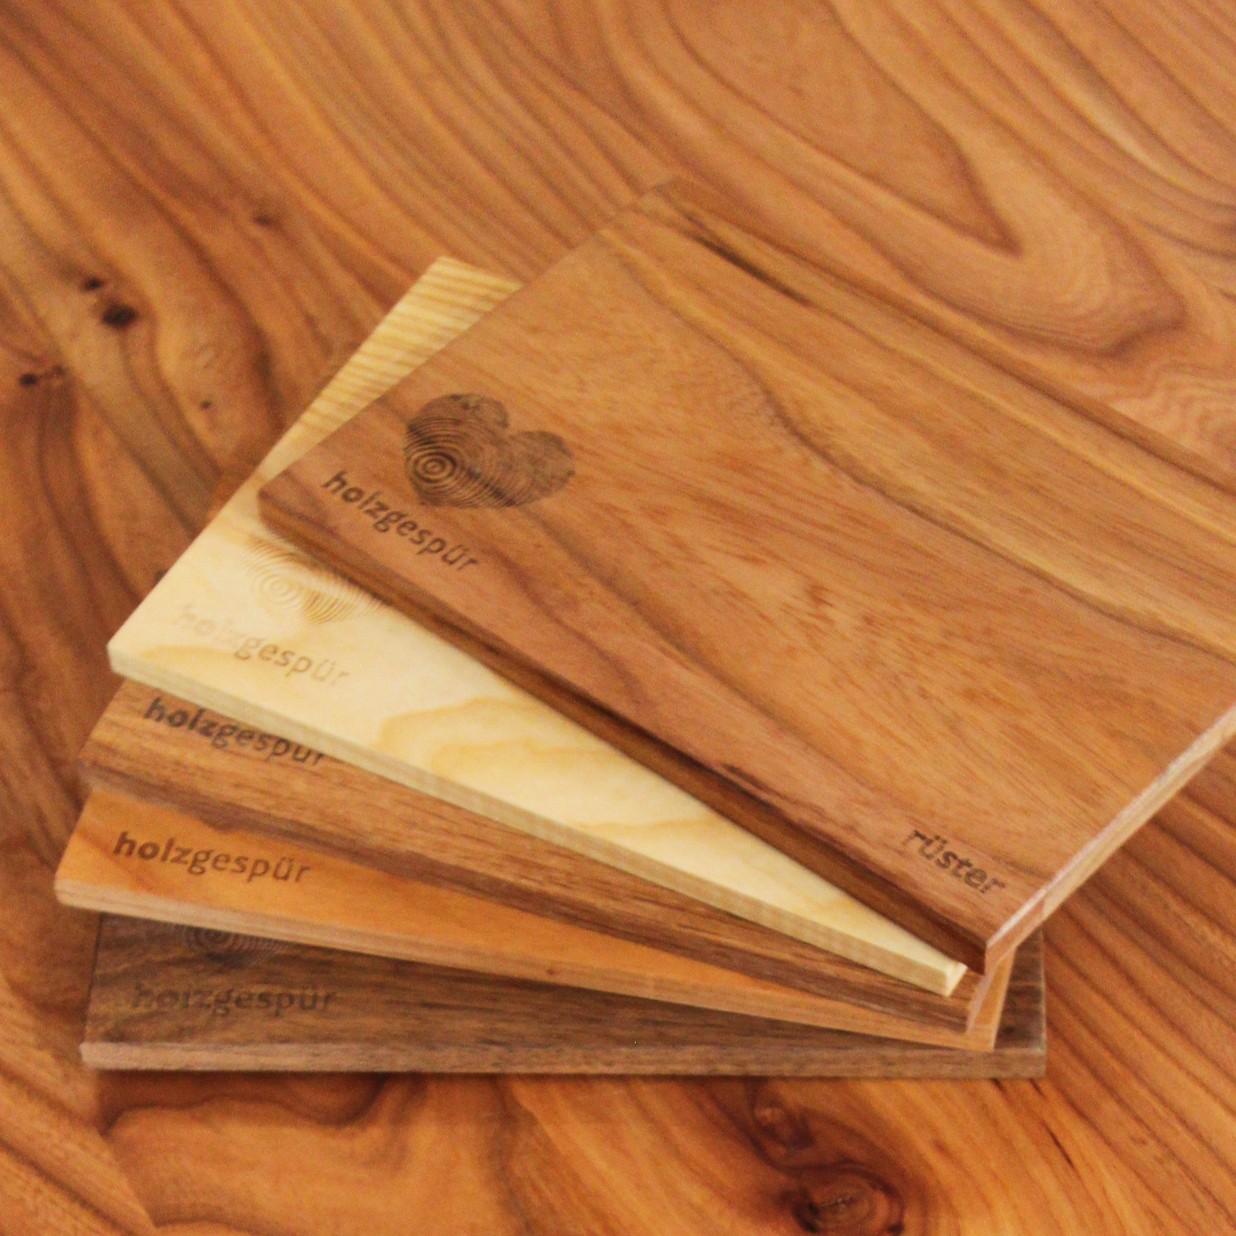 Holzmuster Bestellen Holzgesp R